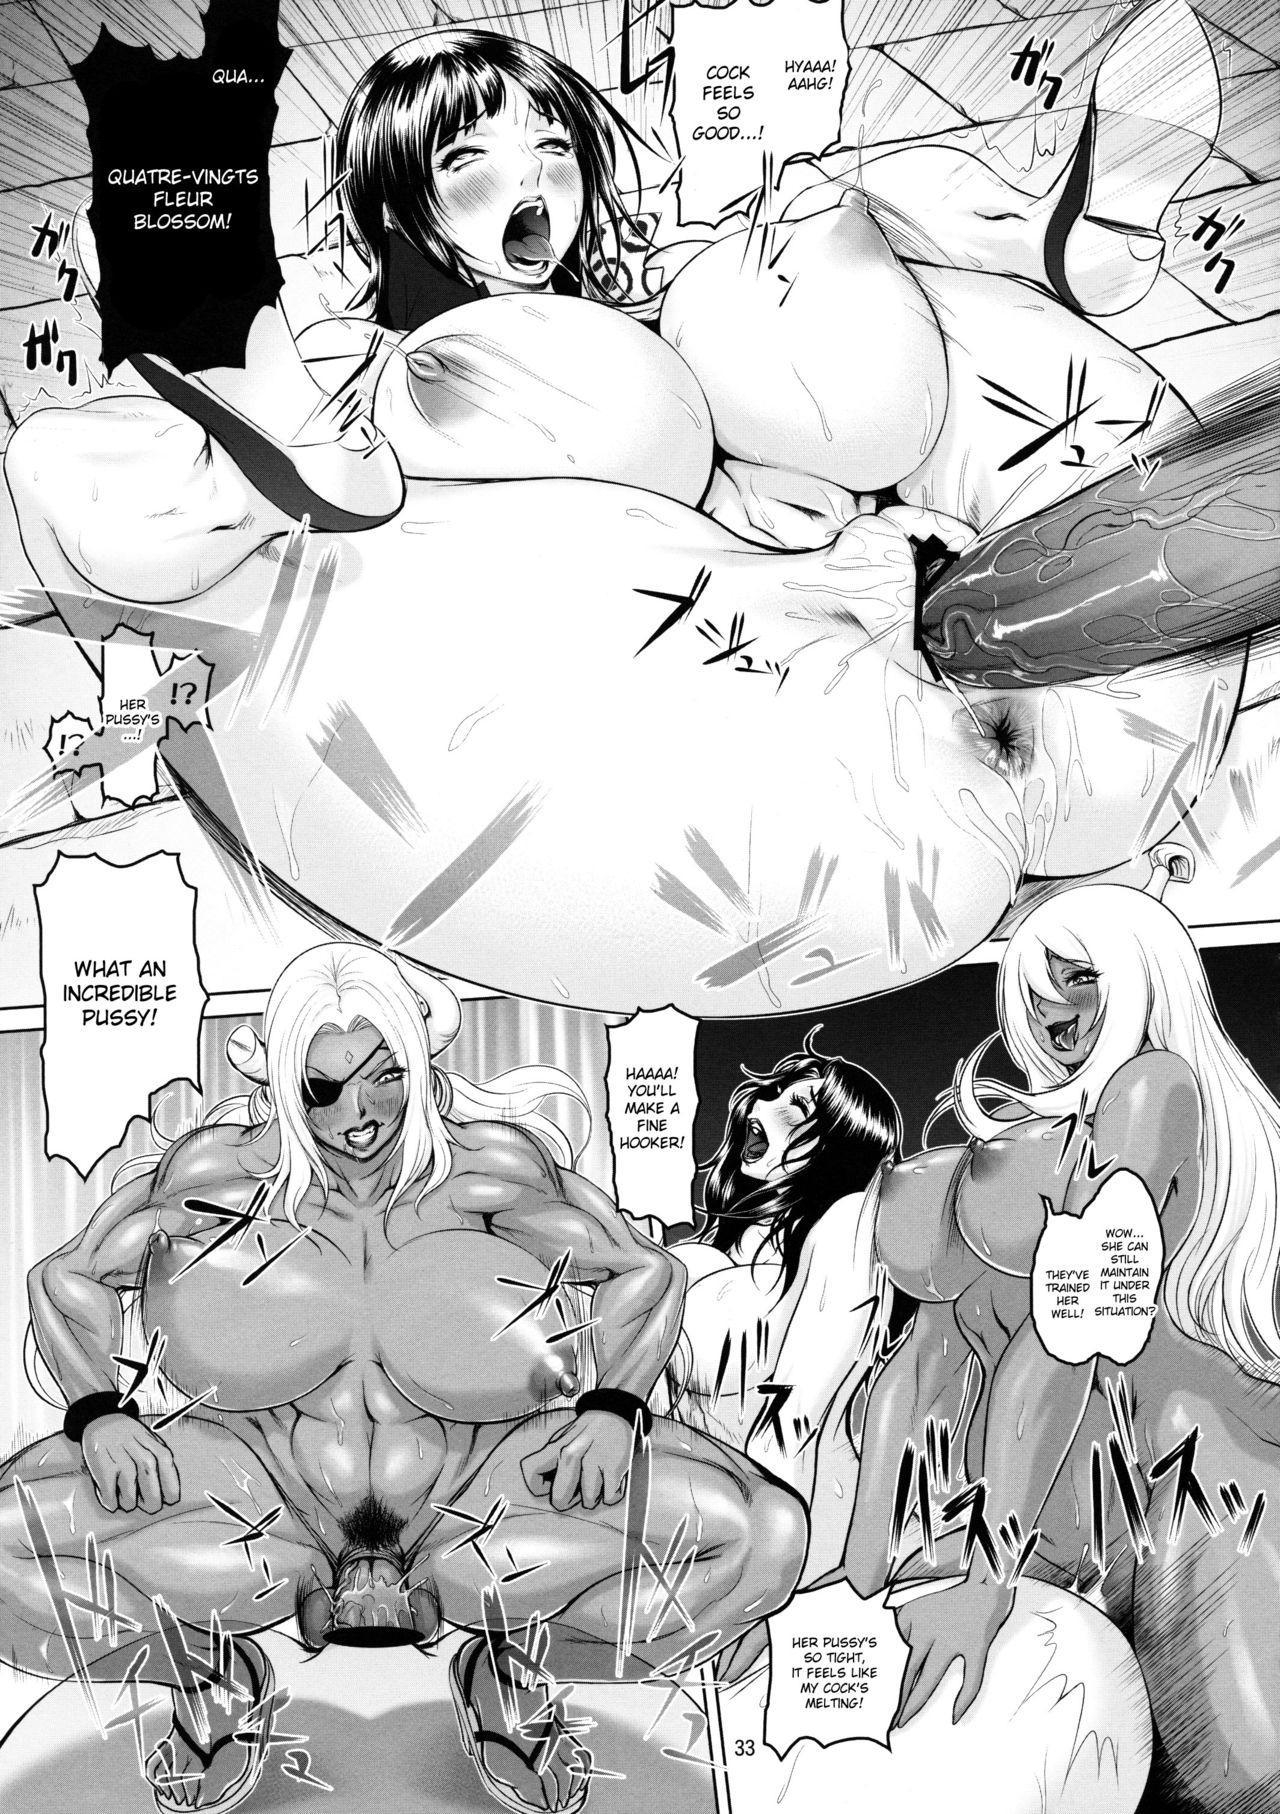 Midare Saki Joshuu Kaizoku Soushuuhen   Bloom, Pirate Hooker! Bloom! Annual 31